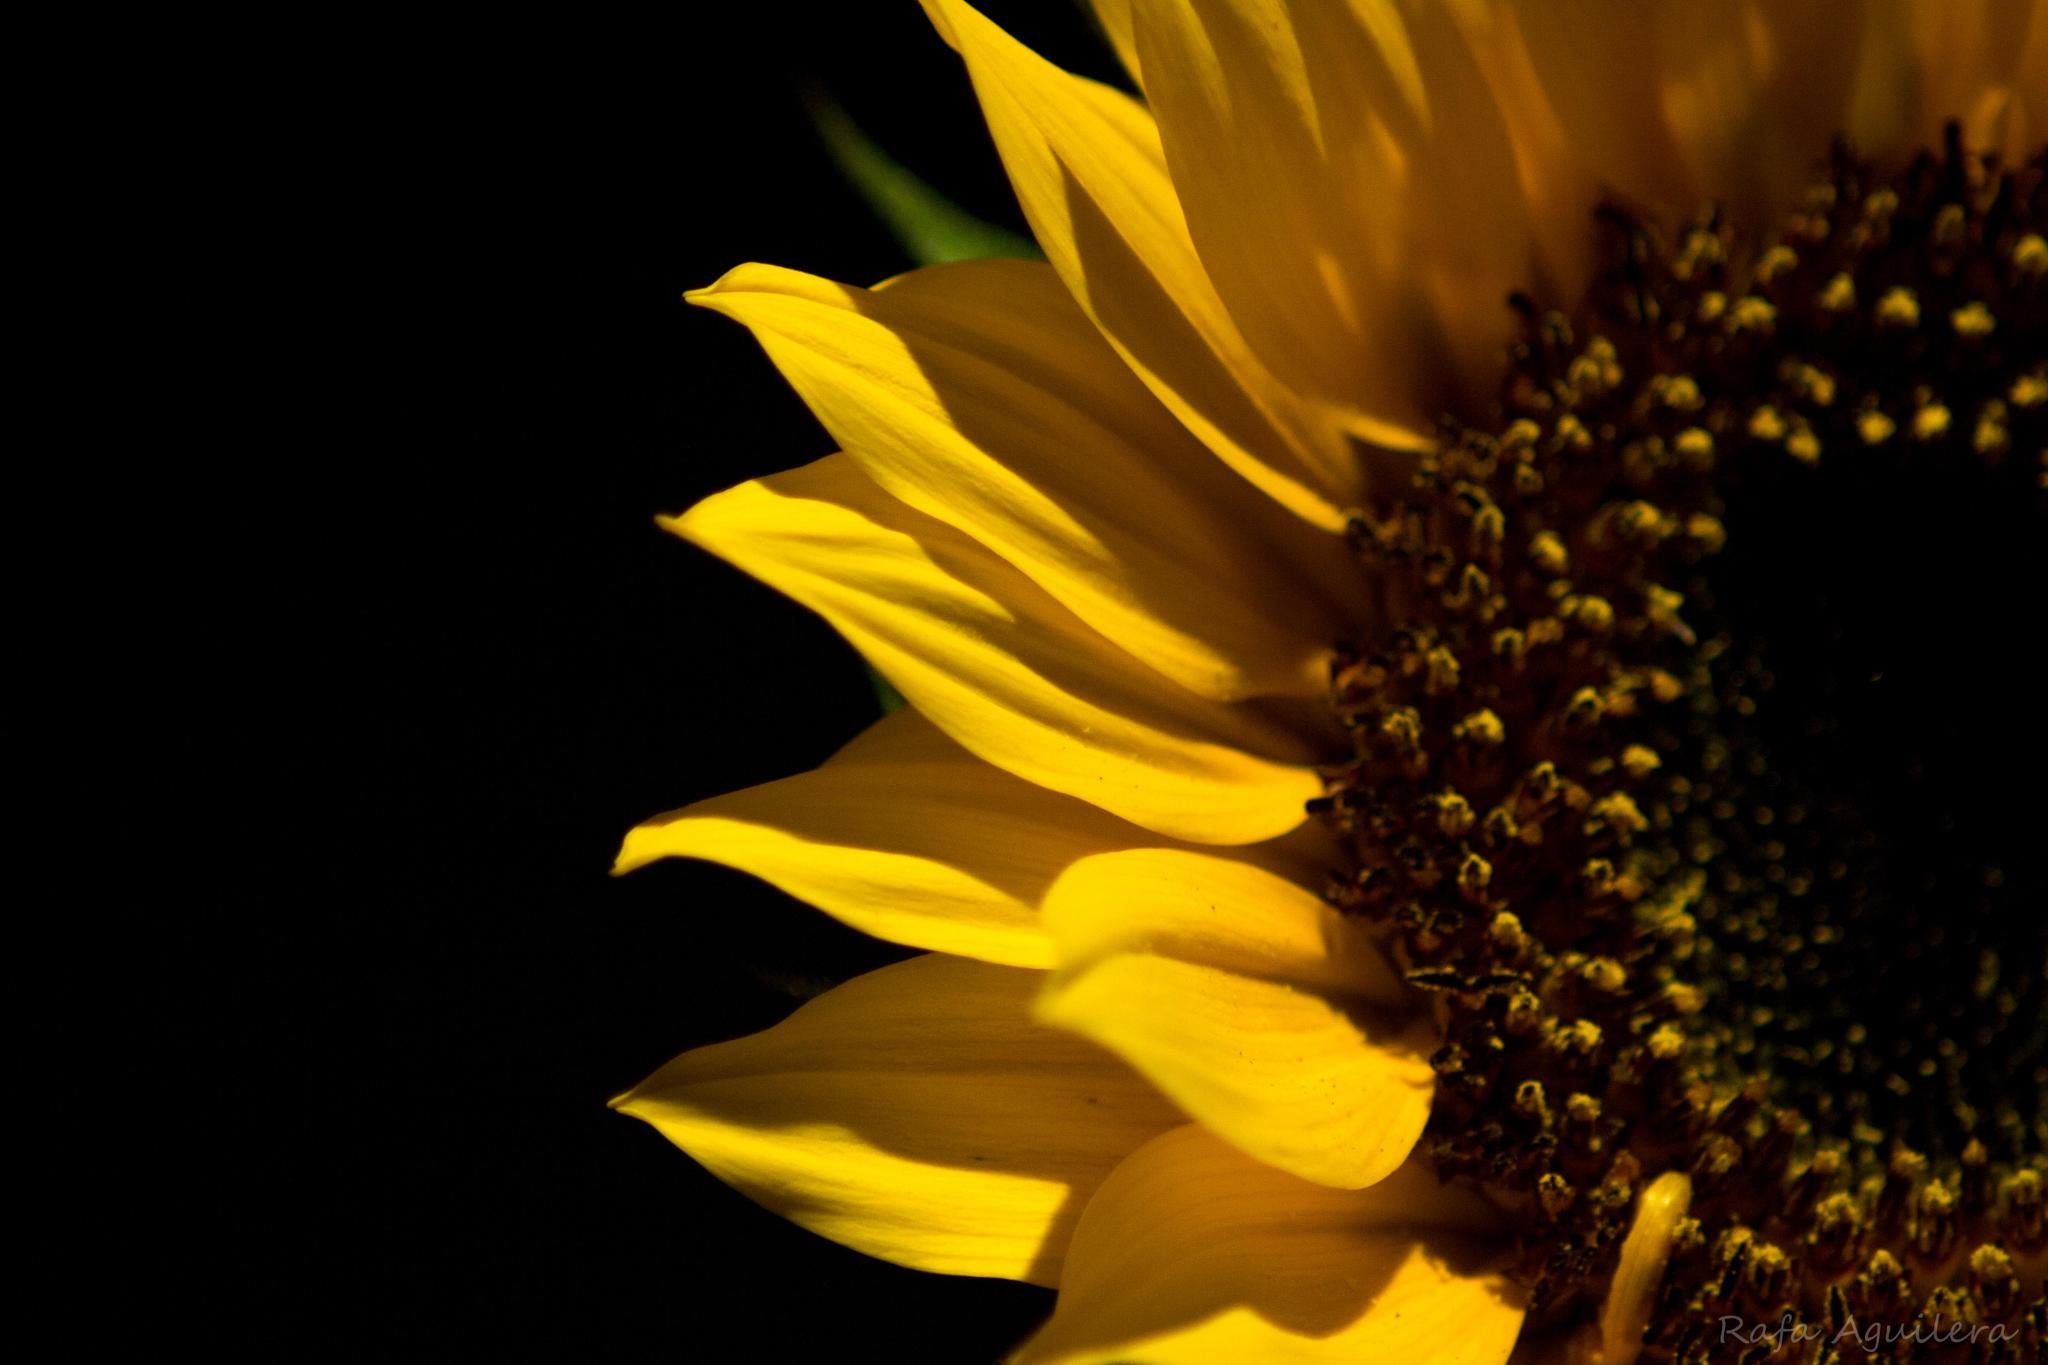 sunflower by Rafael Aguilera